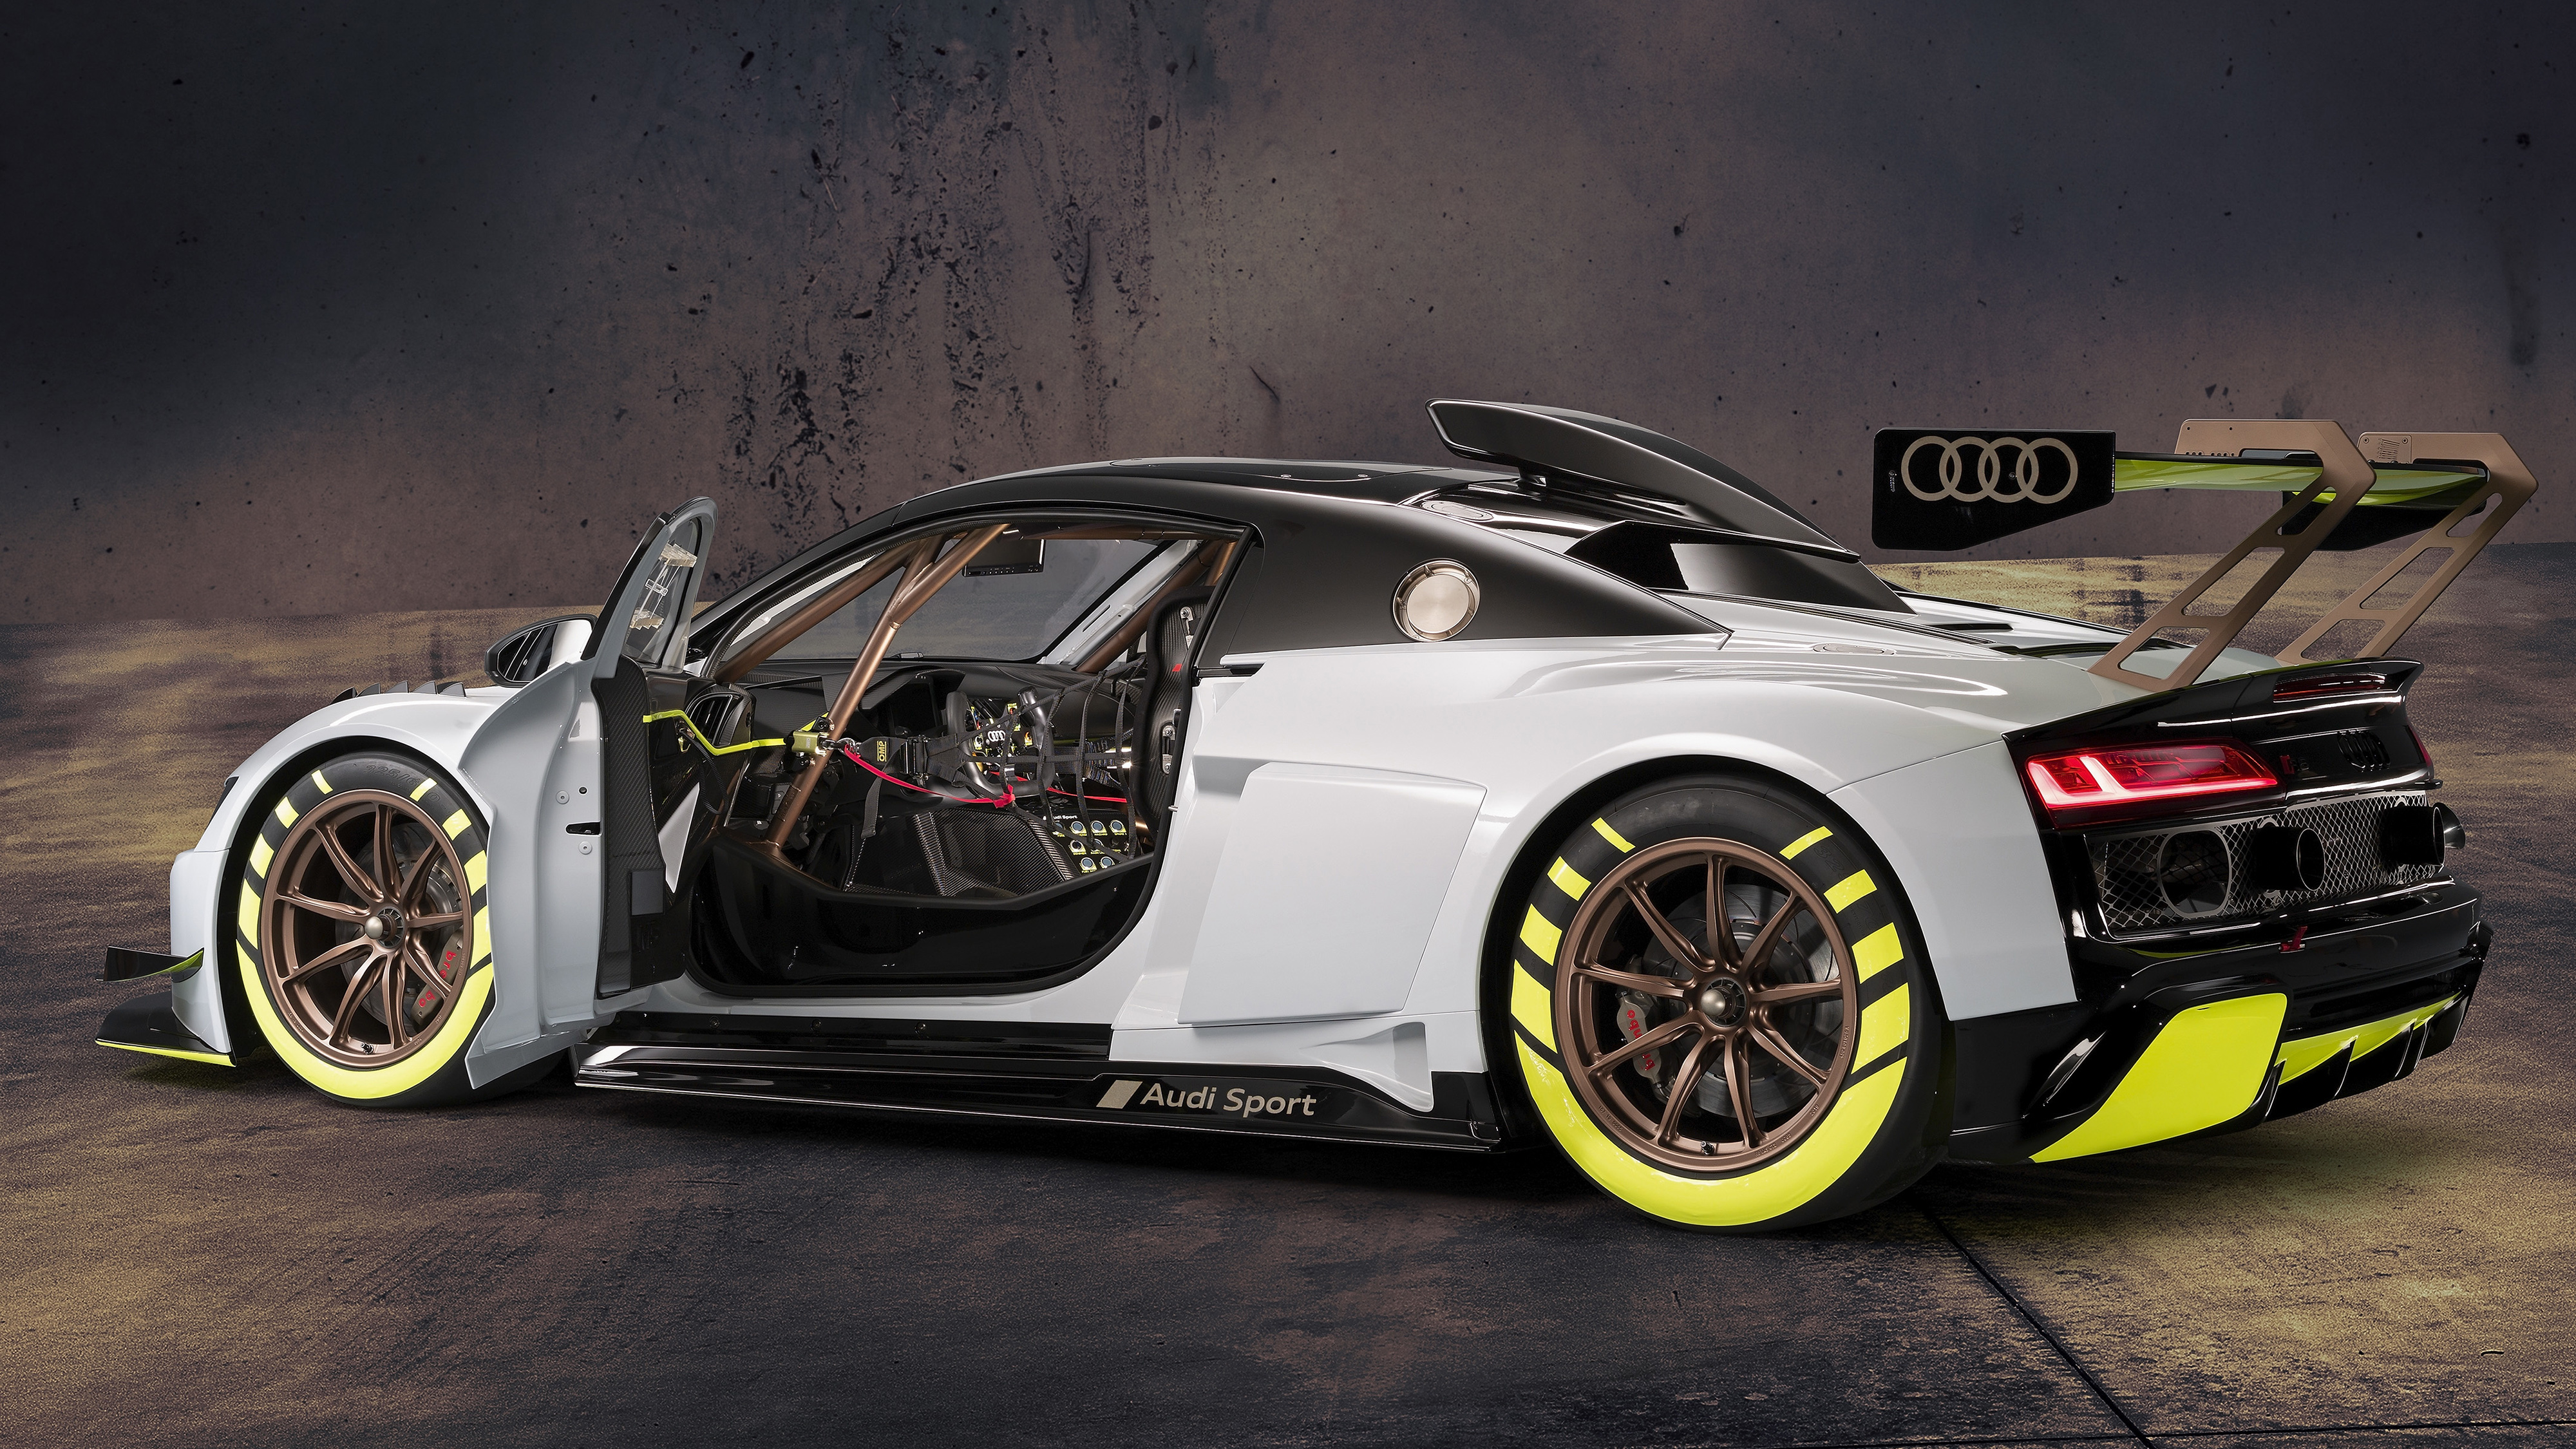 Audi R8 Lms Gt2 4000x2250 Wallpaper Teahub Io